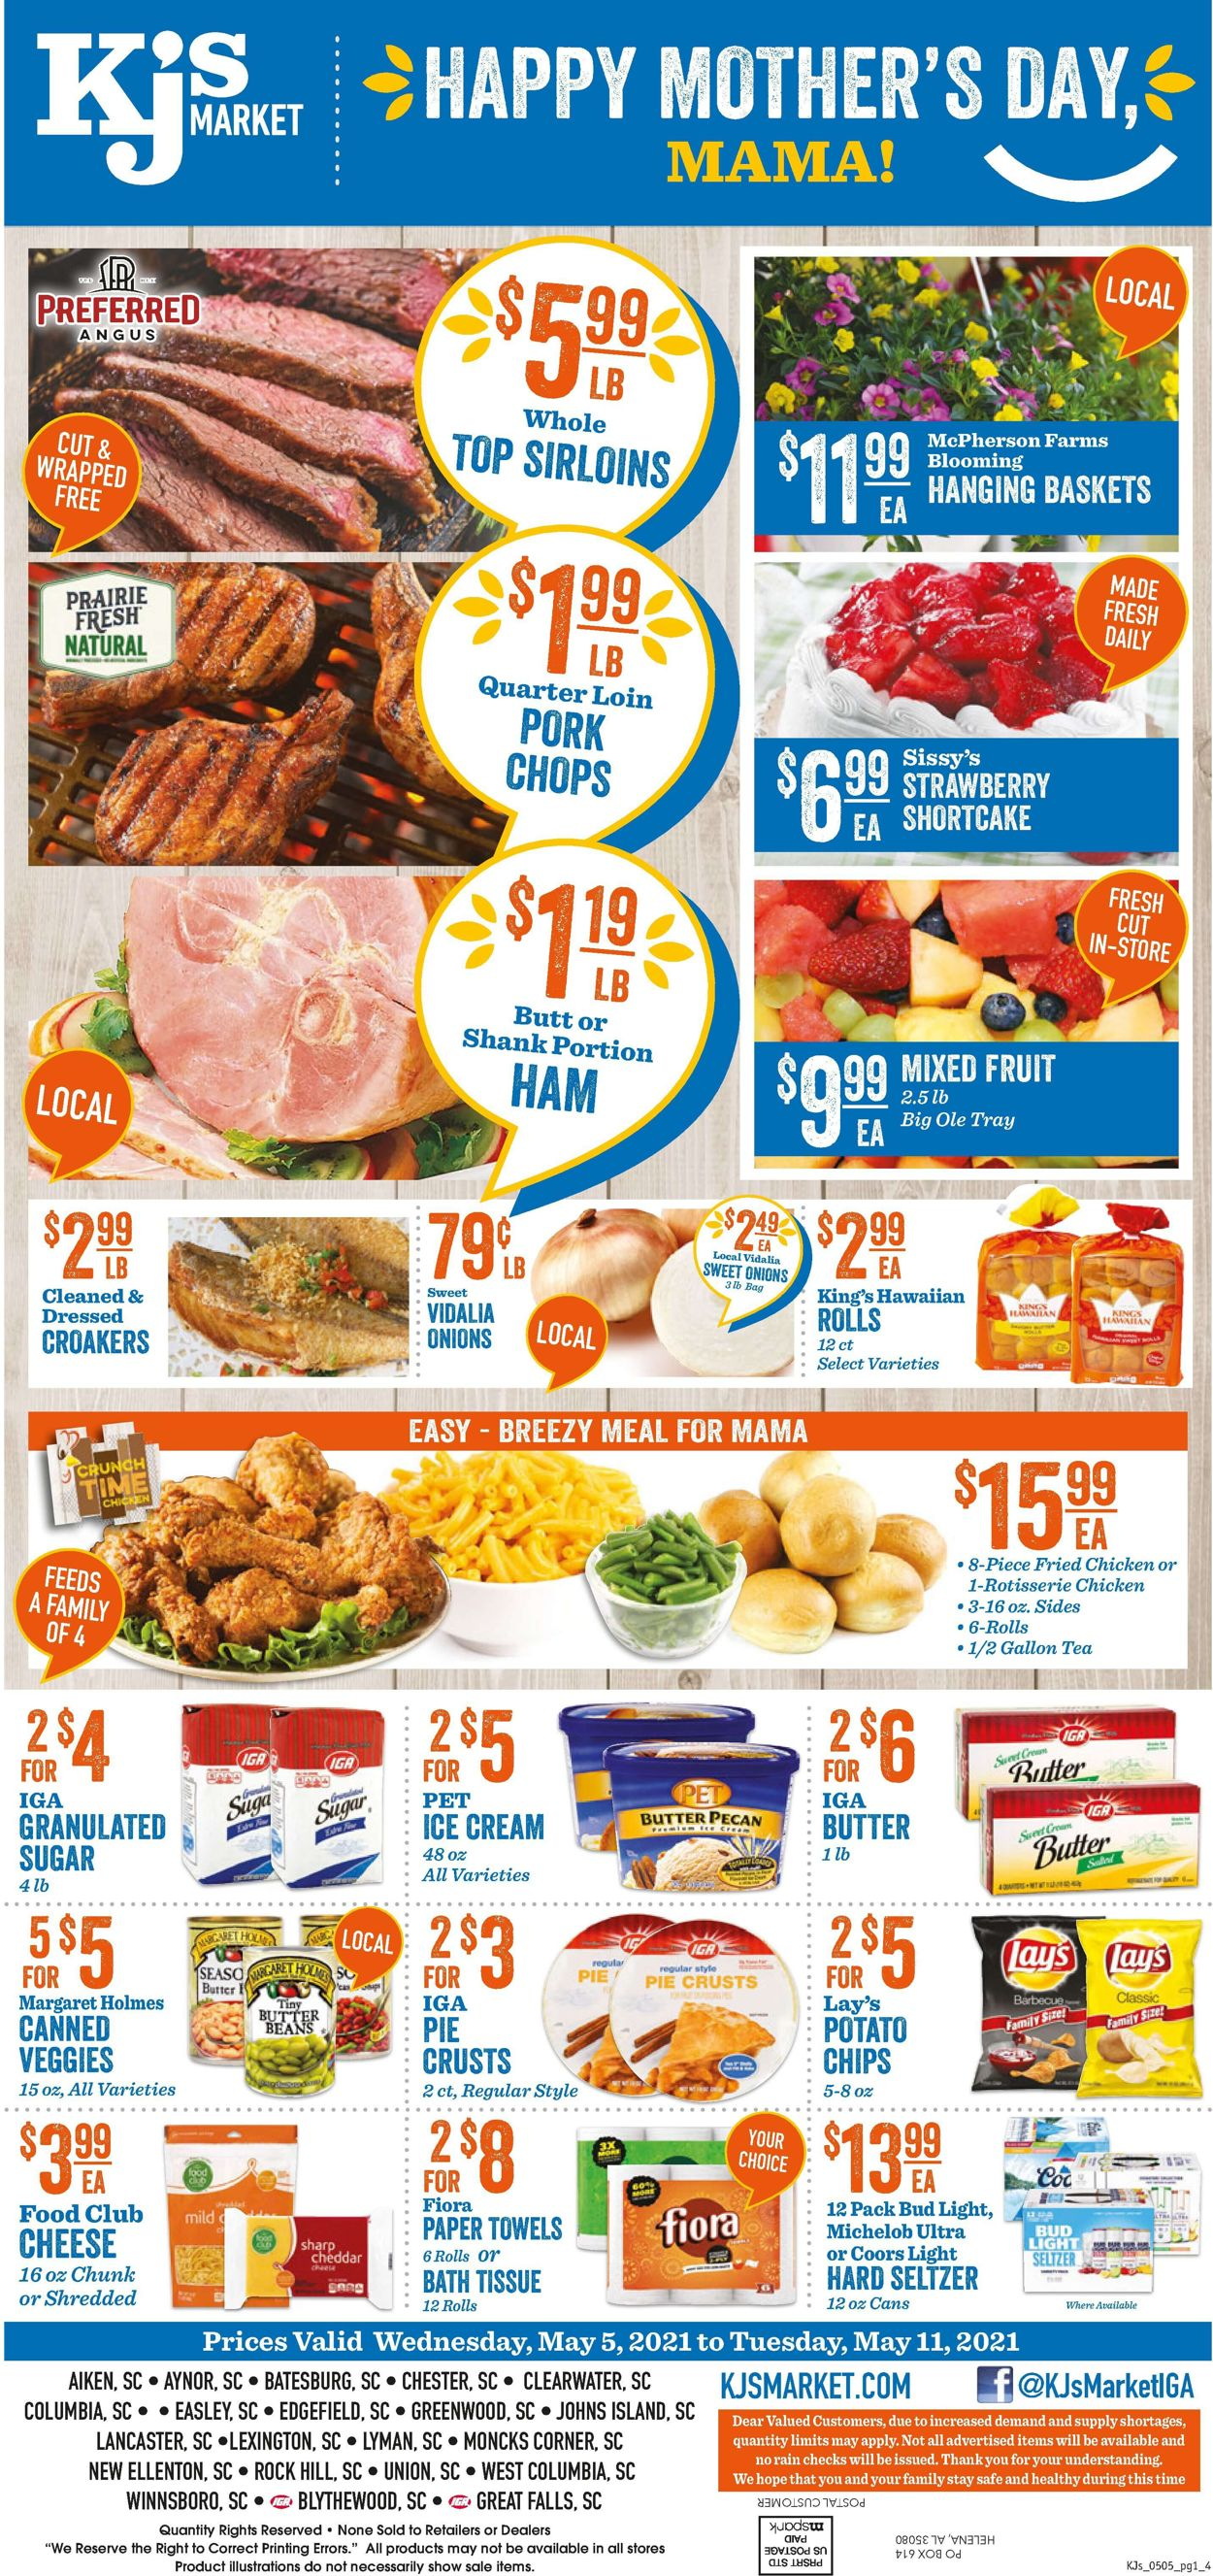 KJ´s Market Weekly Ad Circular - valid 05/05-05/11/2021